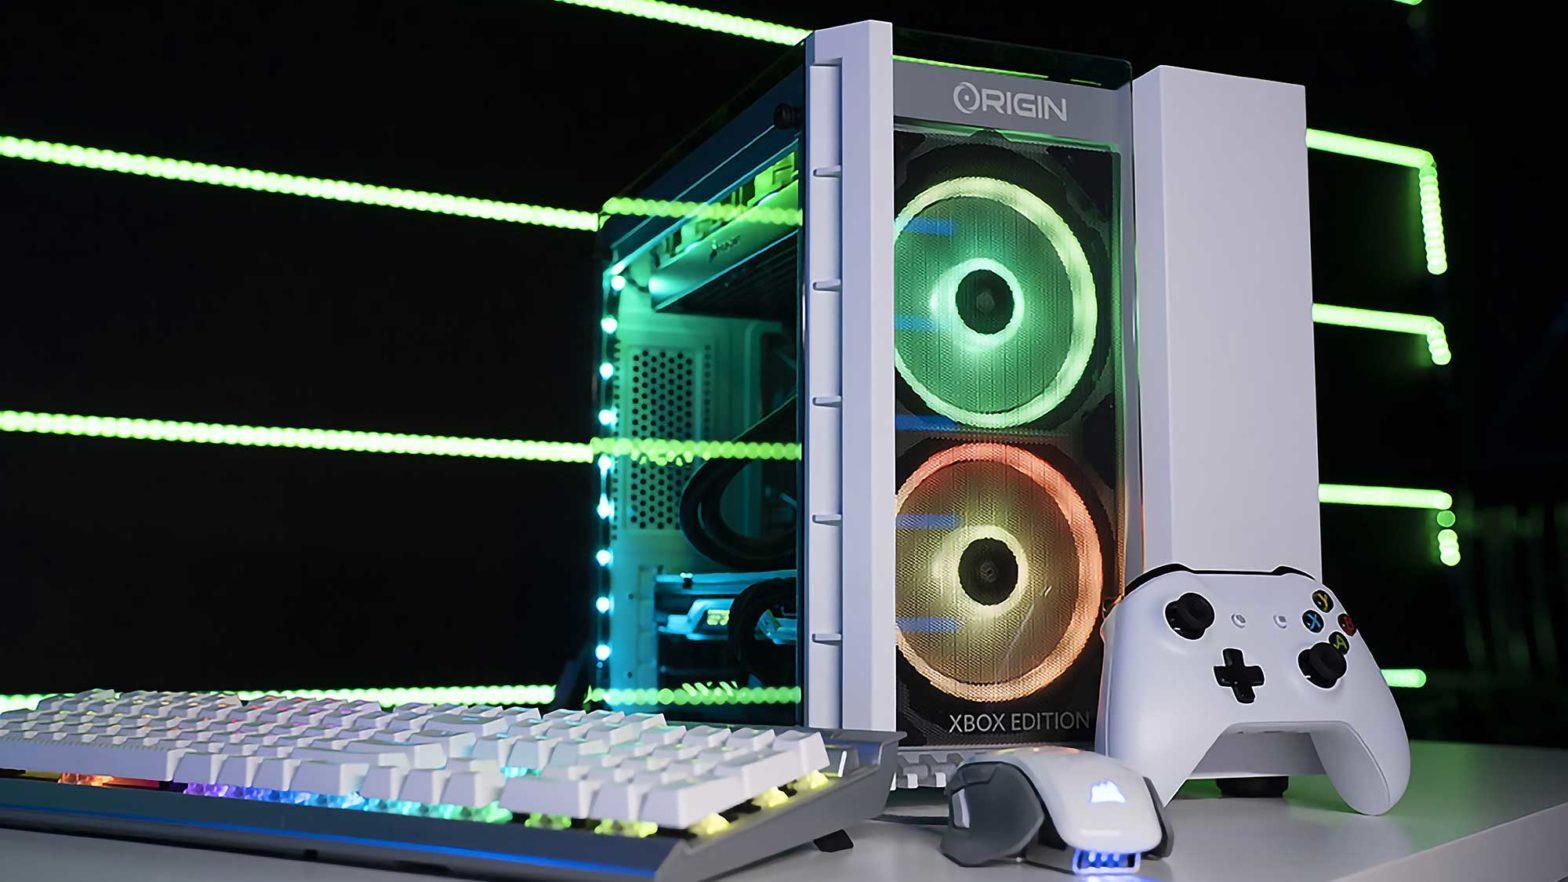 Origin PC Big O Console and Gaming PC